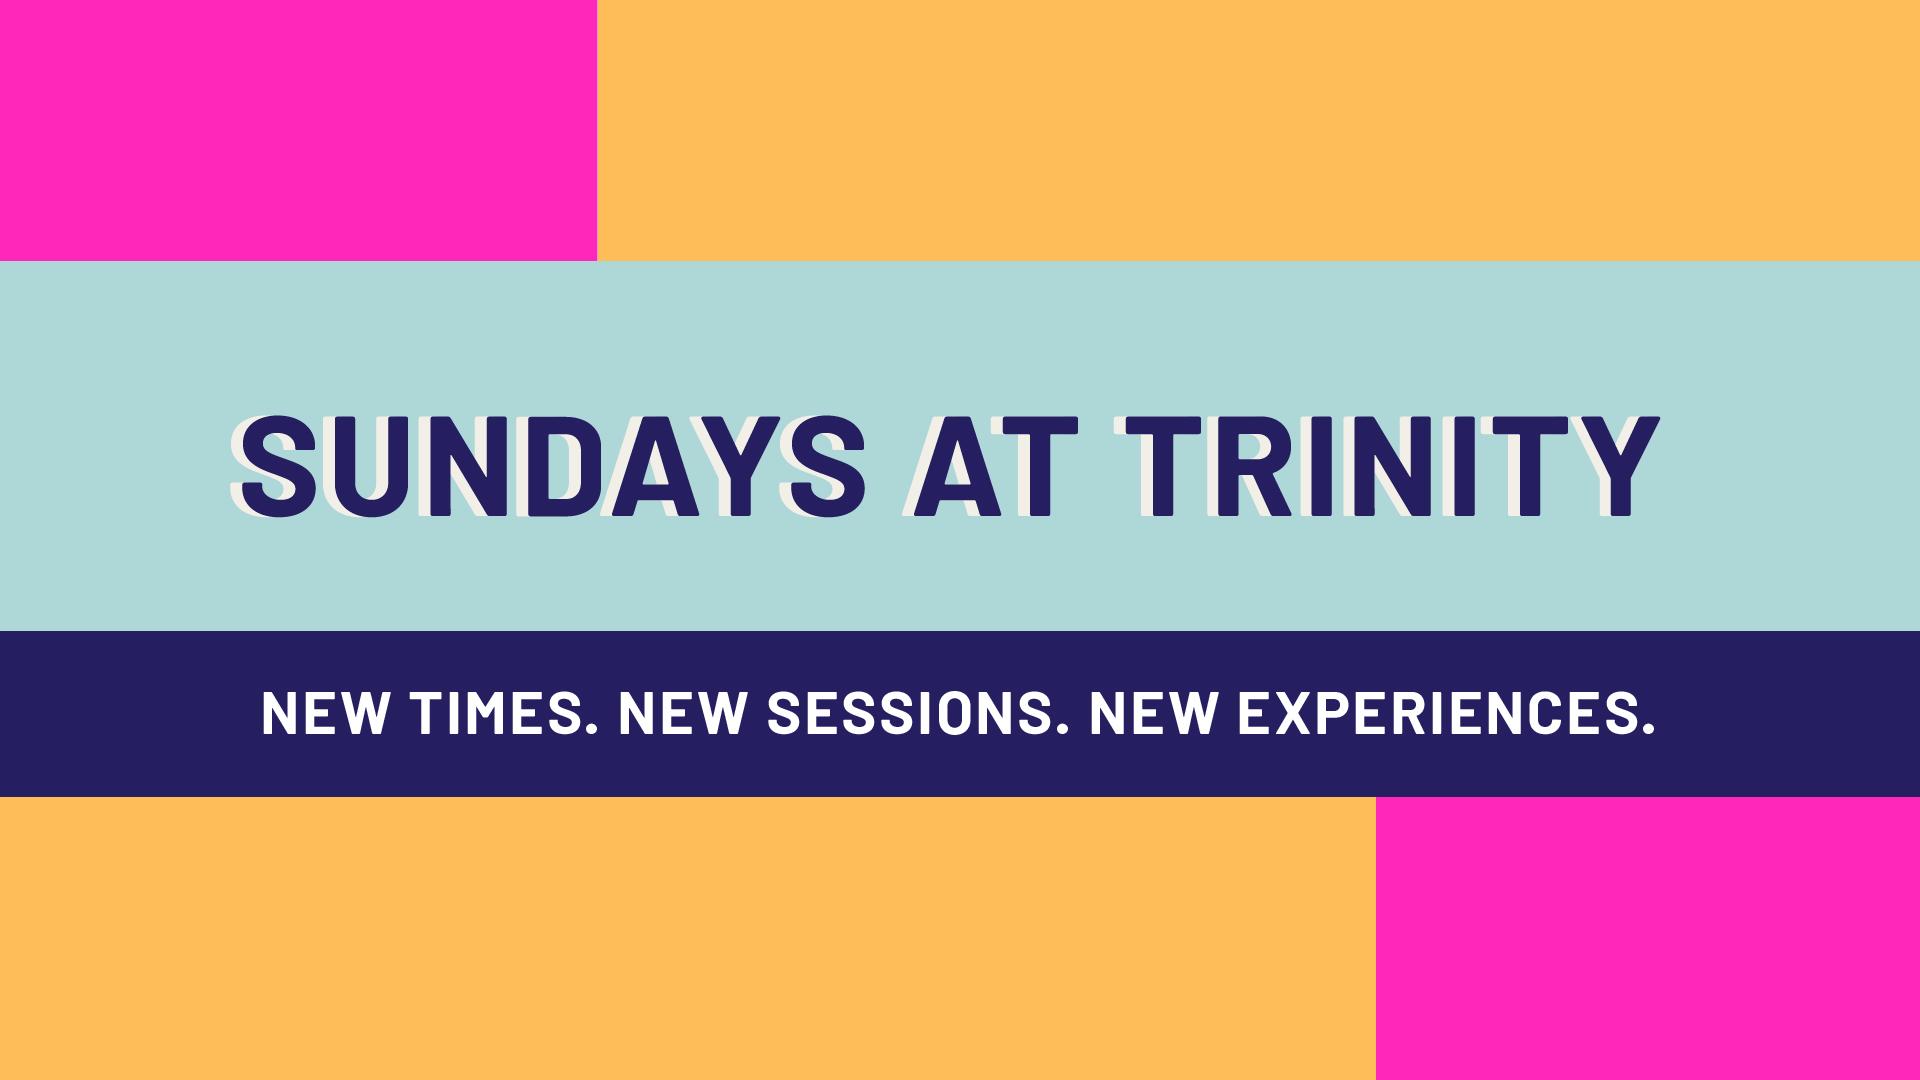 Sundays-at-Trinity_Screen-Slide_Web-App.jpg?mtime=20200814152807#asset:251429